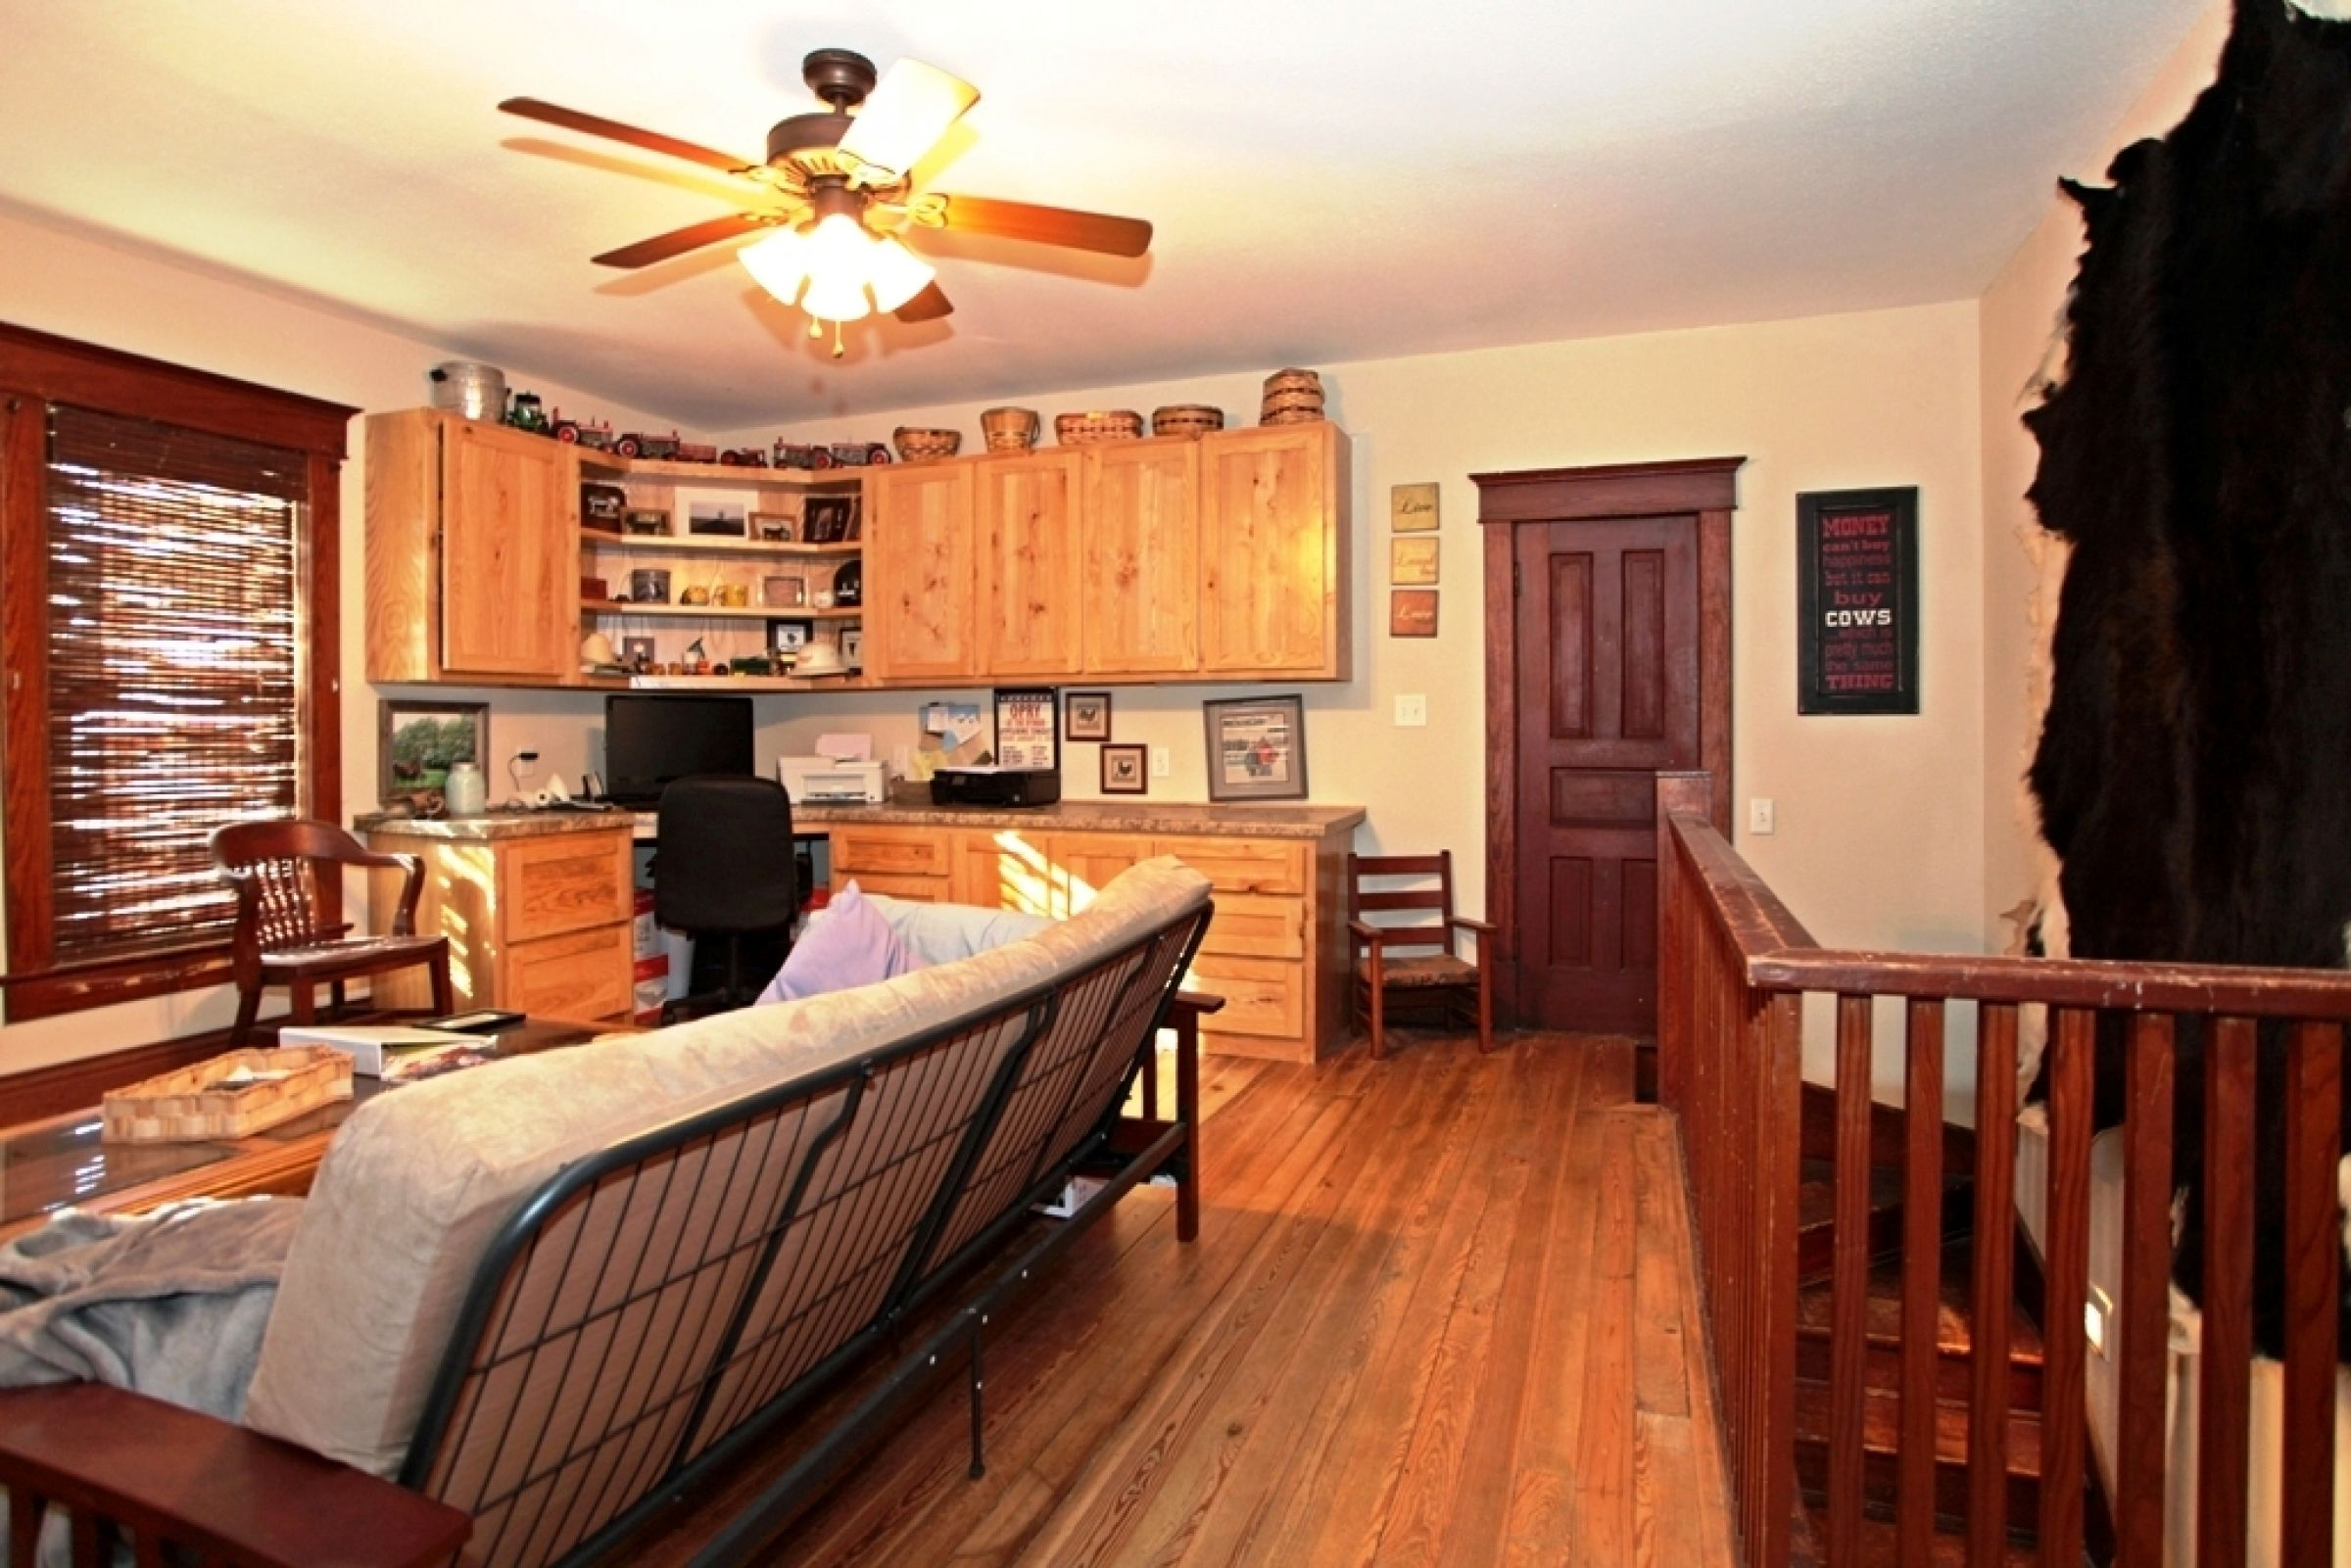 residential-wayne-county-iowa-1-acres-listing-number-15243-0-2020-11-05-205152.JPG